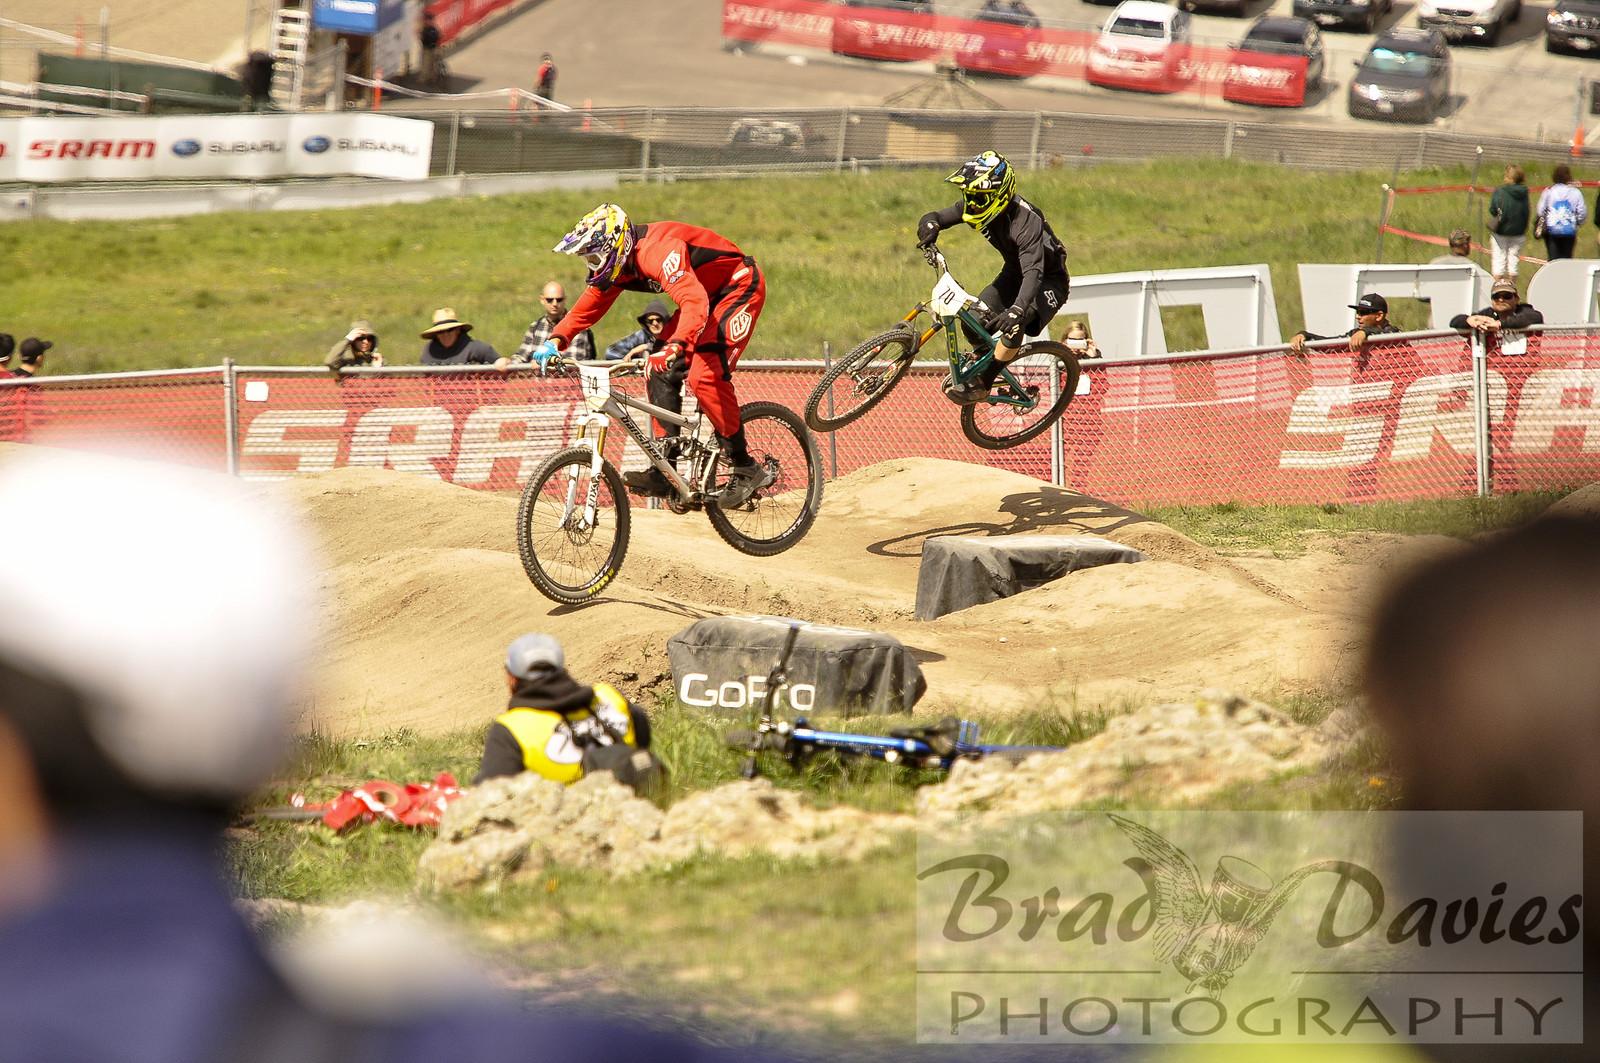 SOC-1 - HourGlassPhotos - Mountain Biking Pictures - Vital MTB